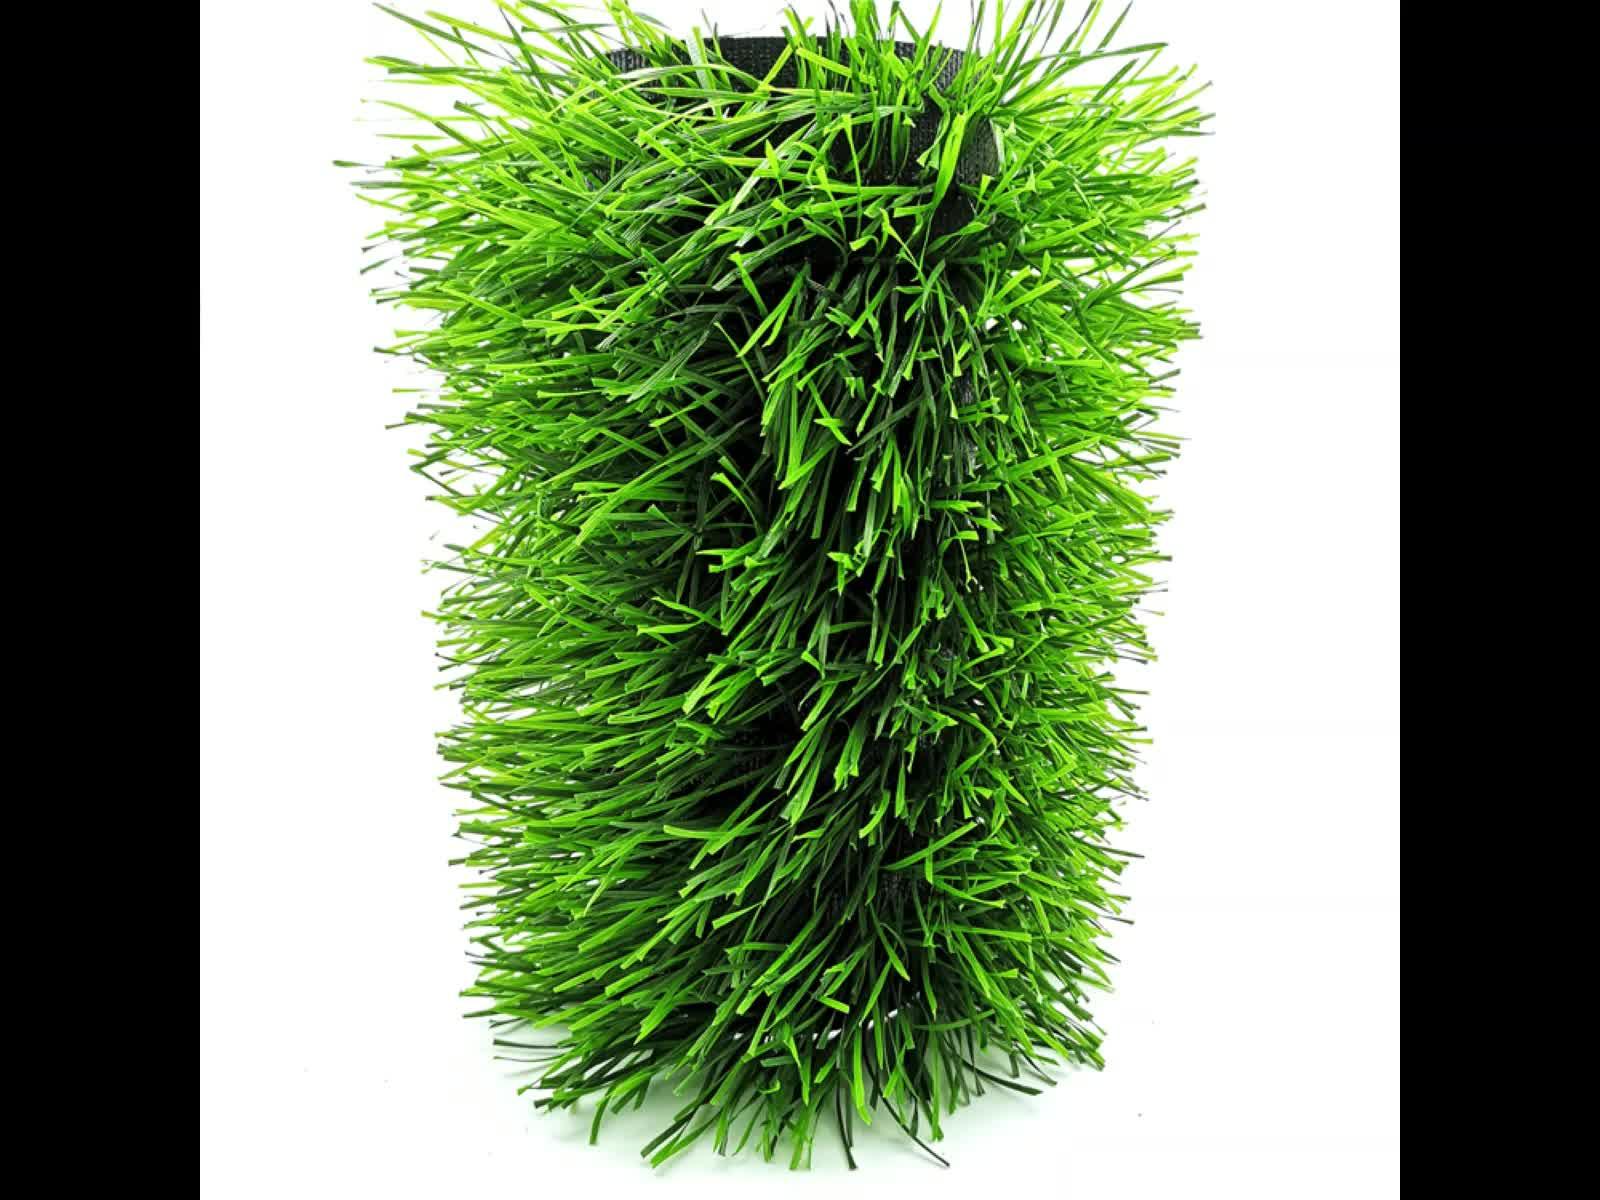 Populaire ontwerp voetbal gras kunstgras voor voetbal veld Voetbal Gras